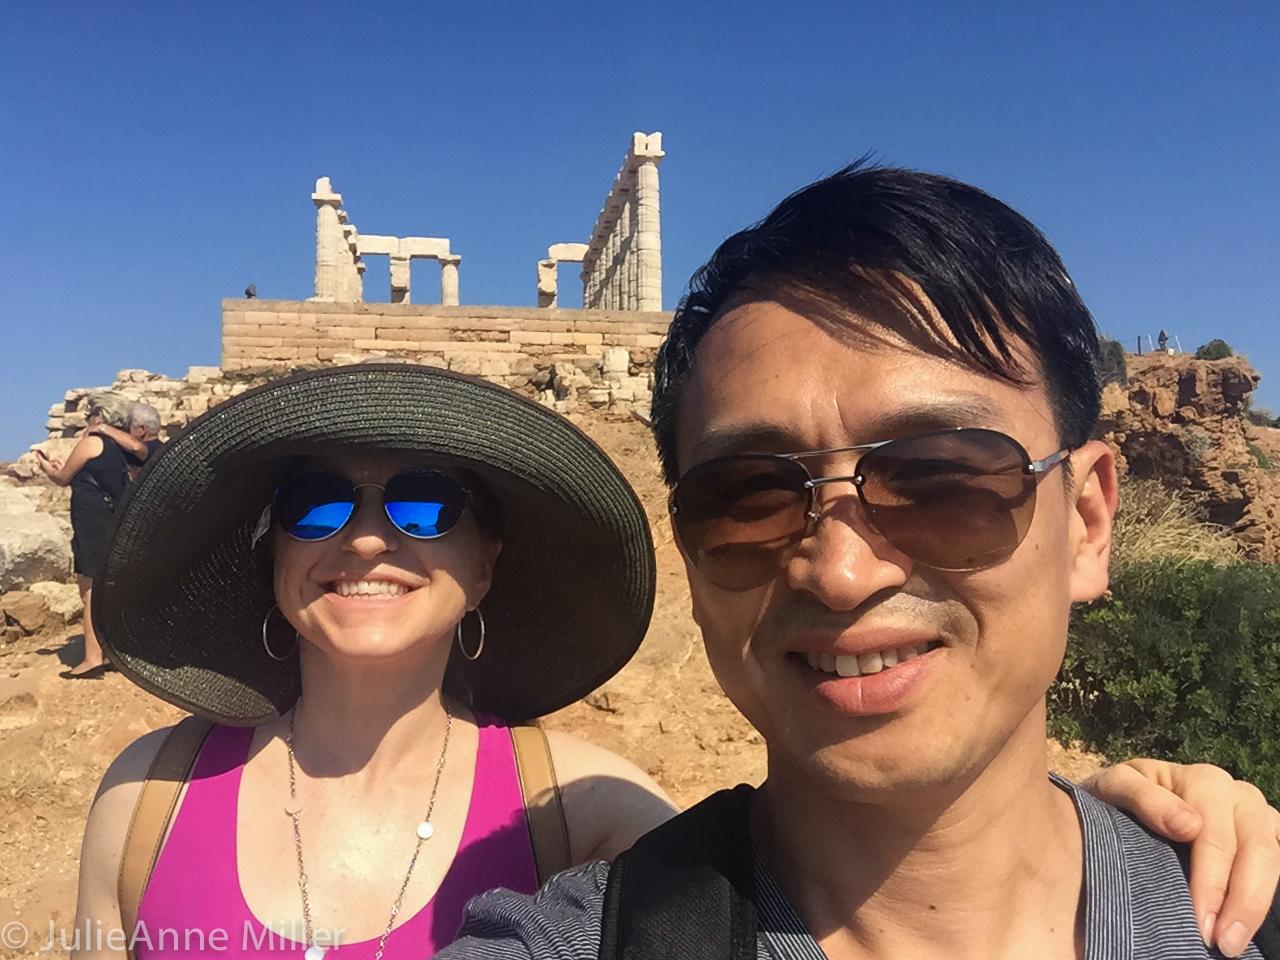 C and J poseidon temple 2.jpg